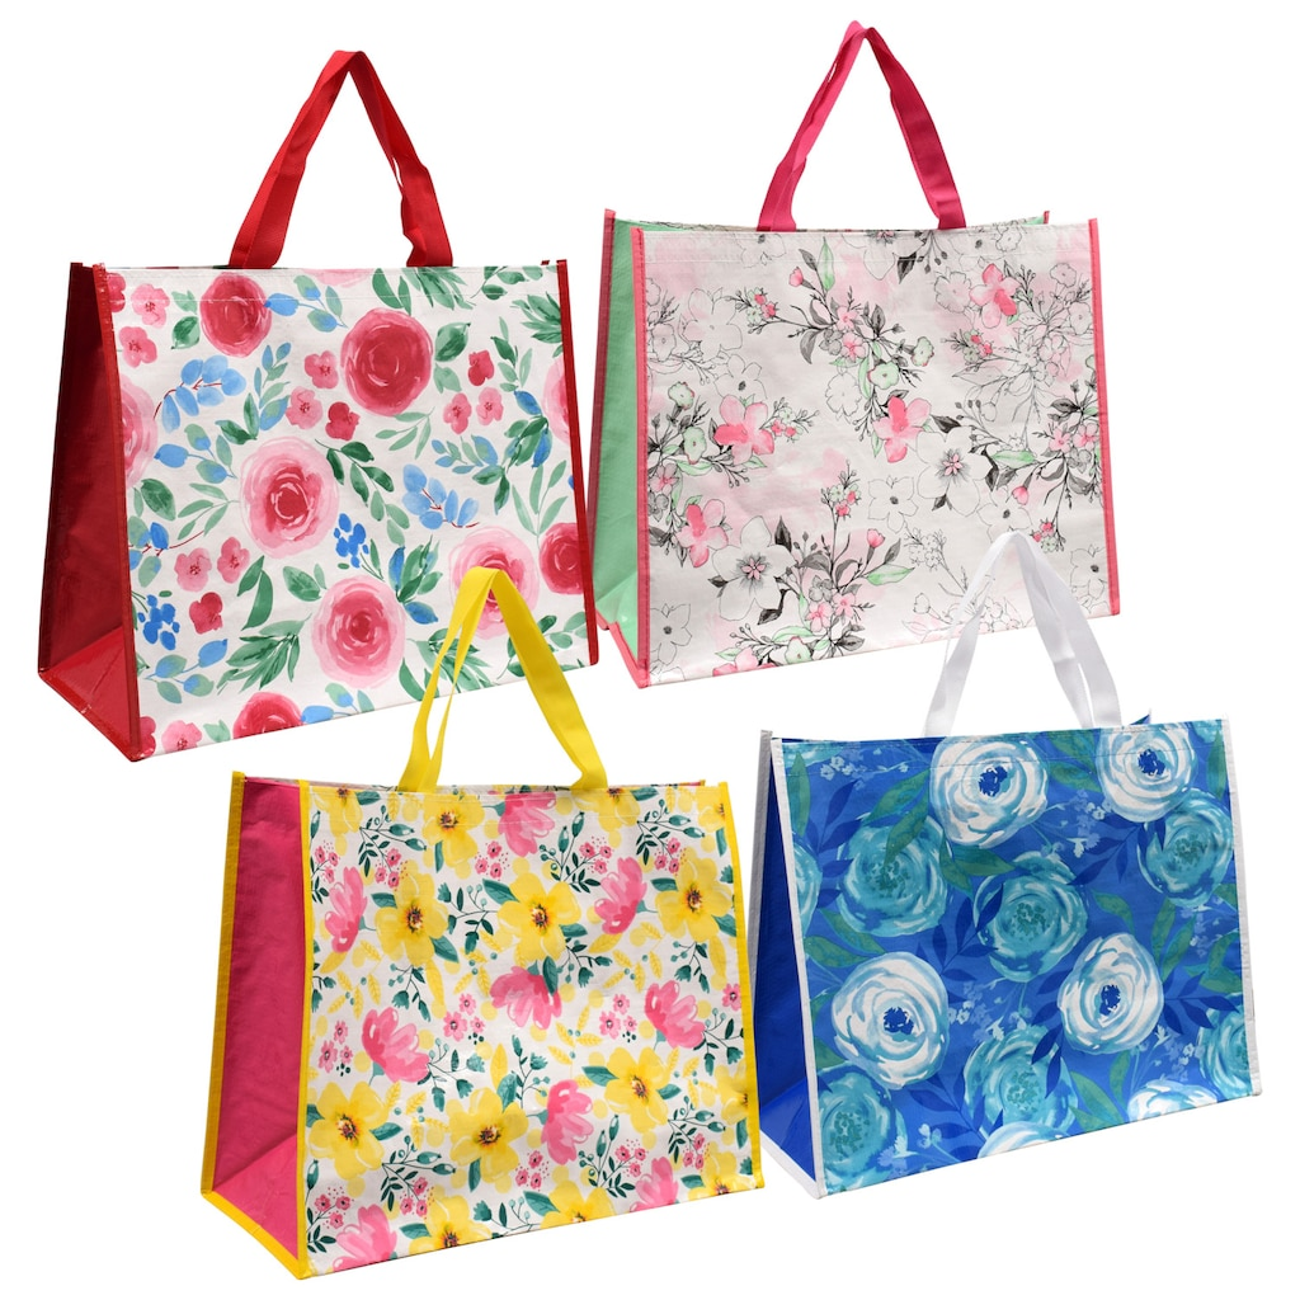 Large Laminated Mandala Fashion Tote Bags